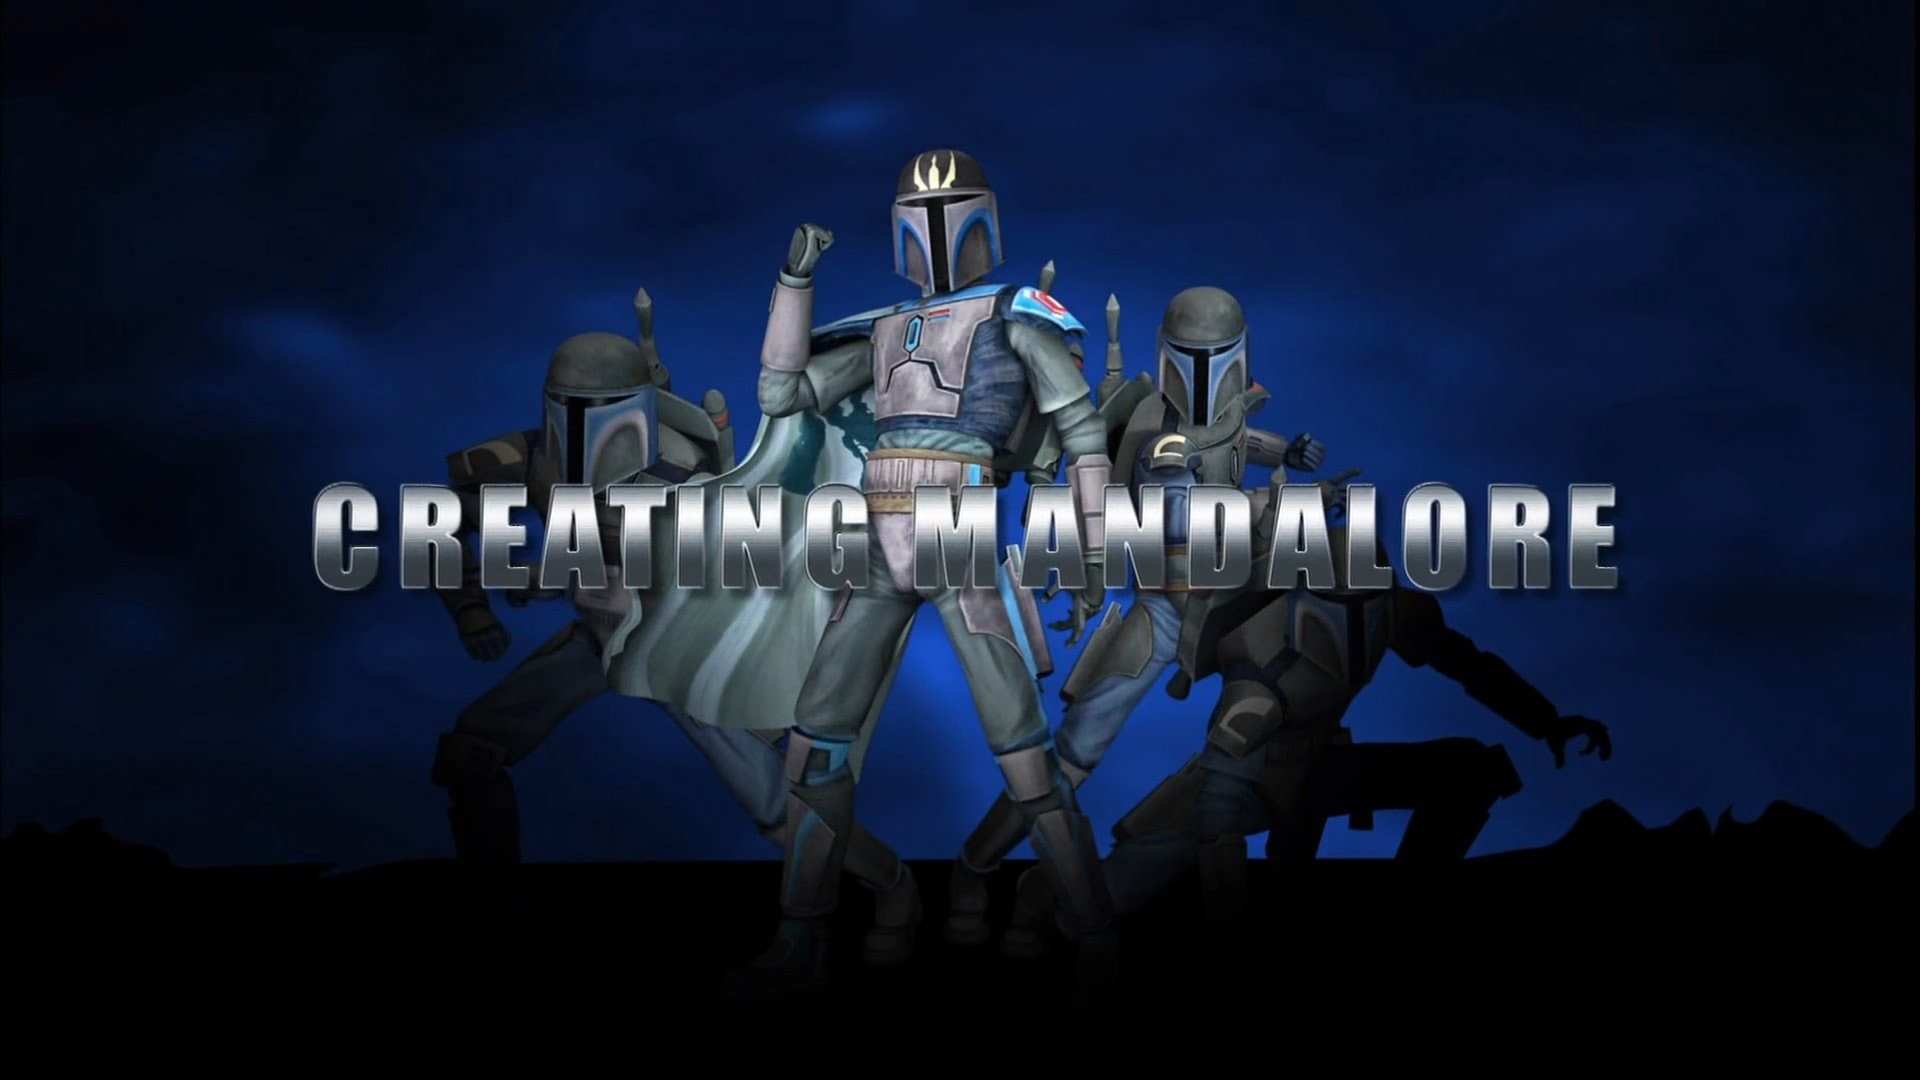 Star Wars The Clone Wars Season Two: Creating Mandalore Featurette – YouTube